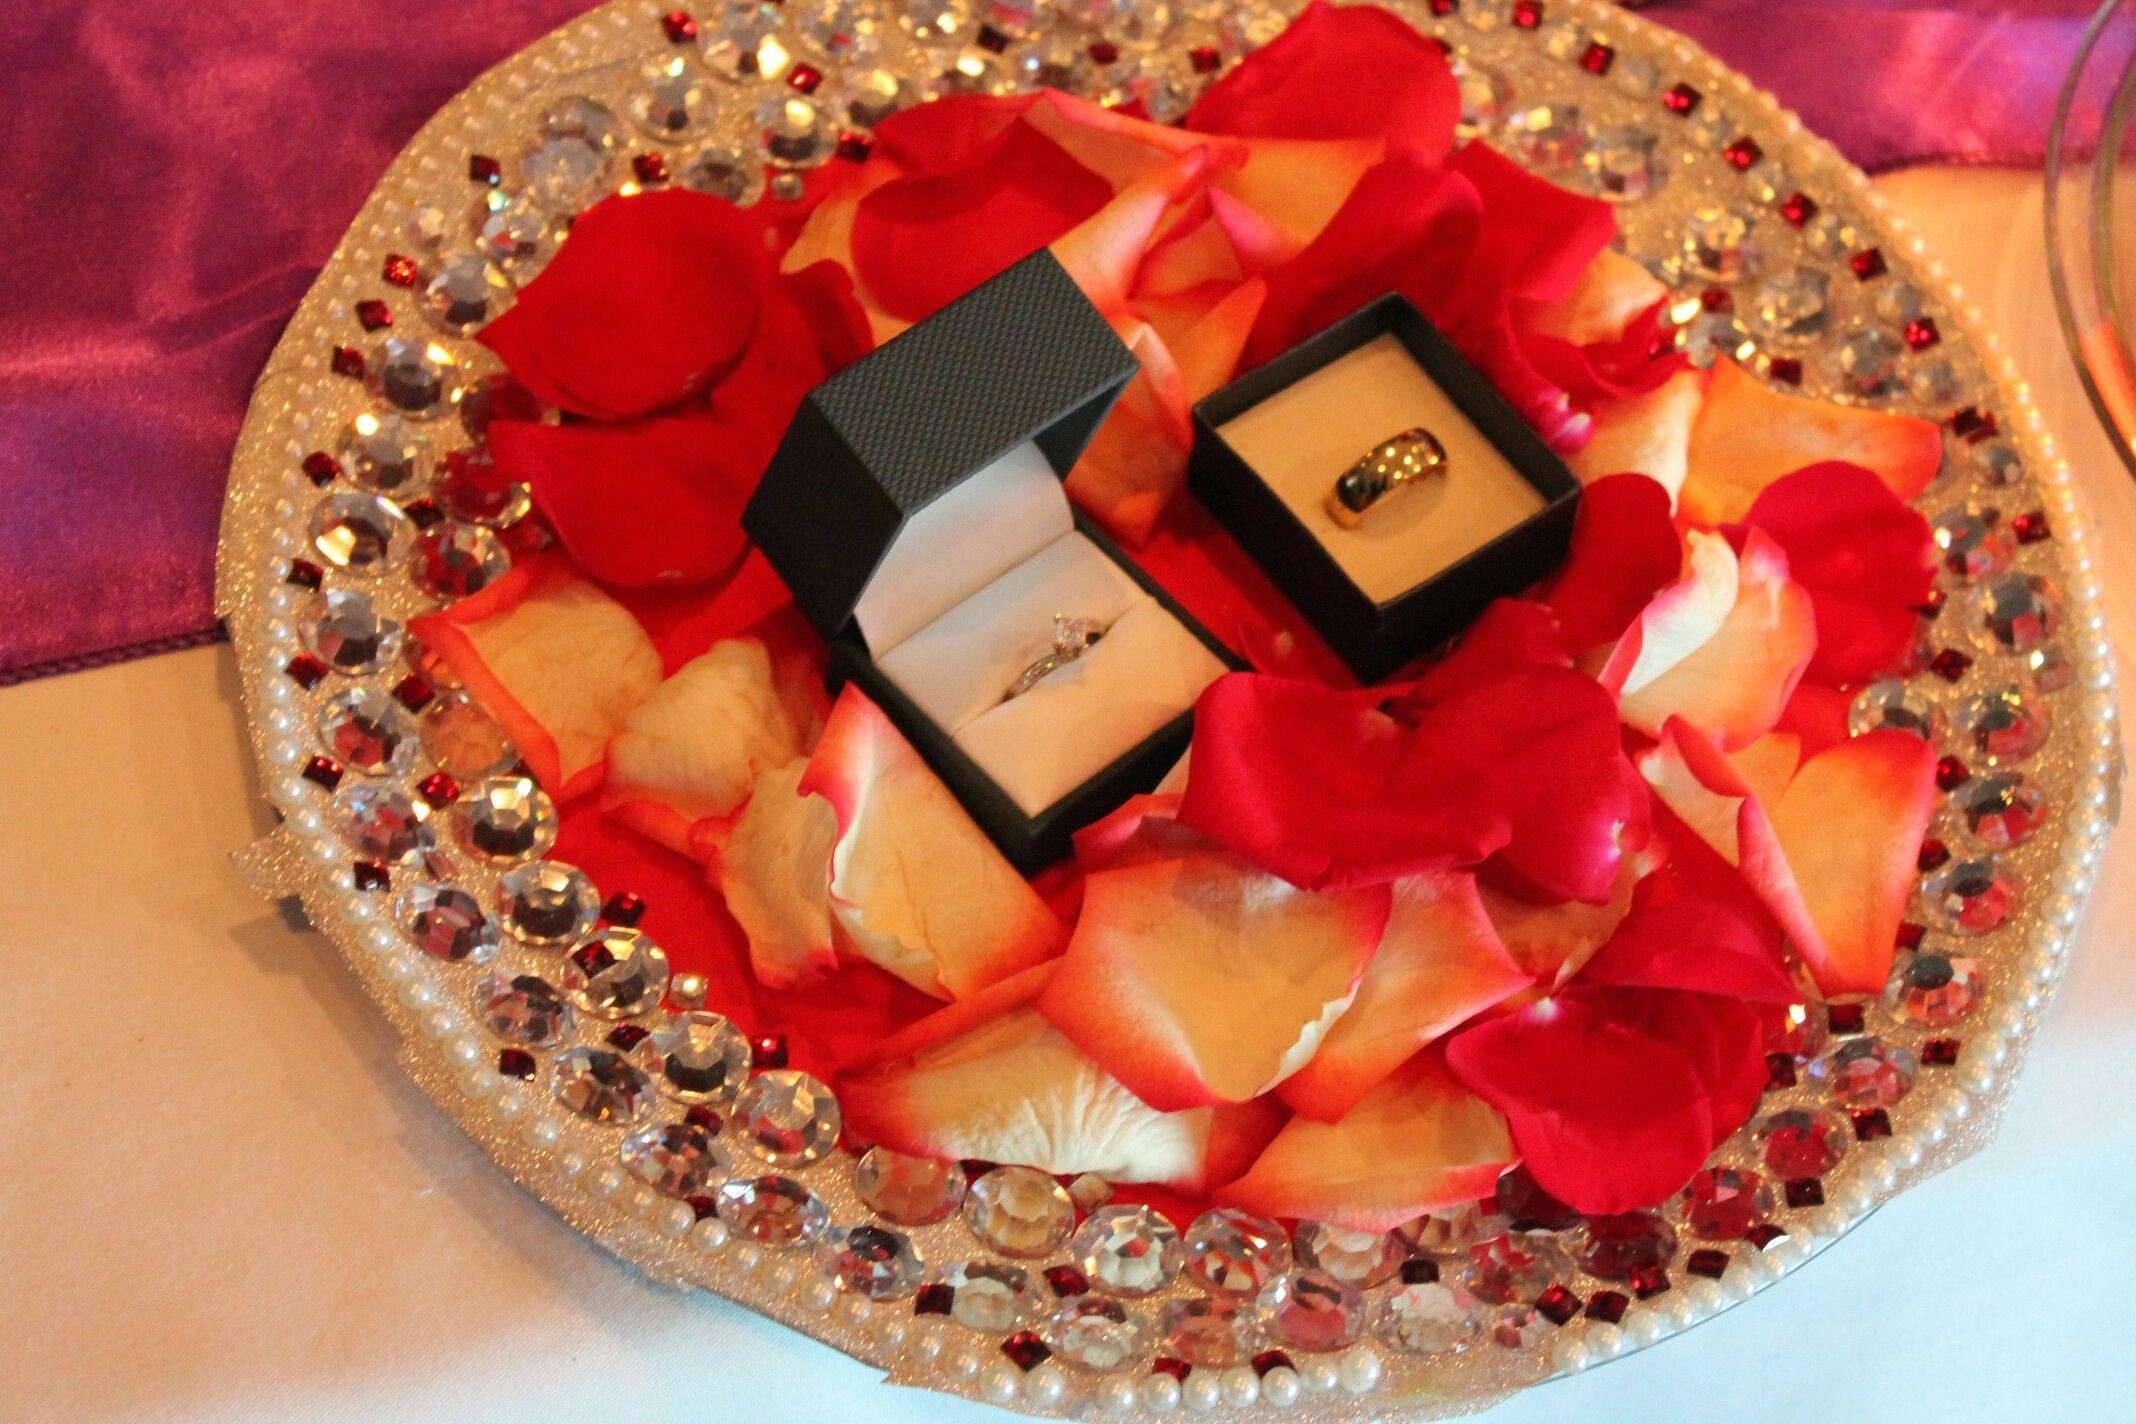 Creative Engagement Ring Platter Ideas Engagement ring